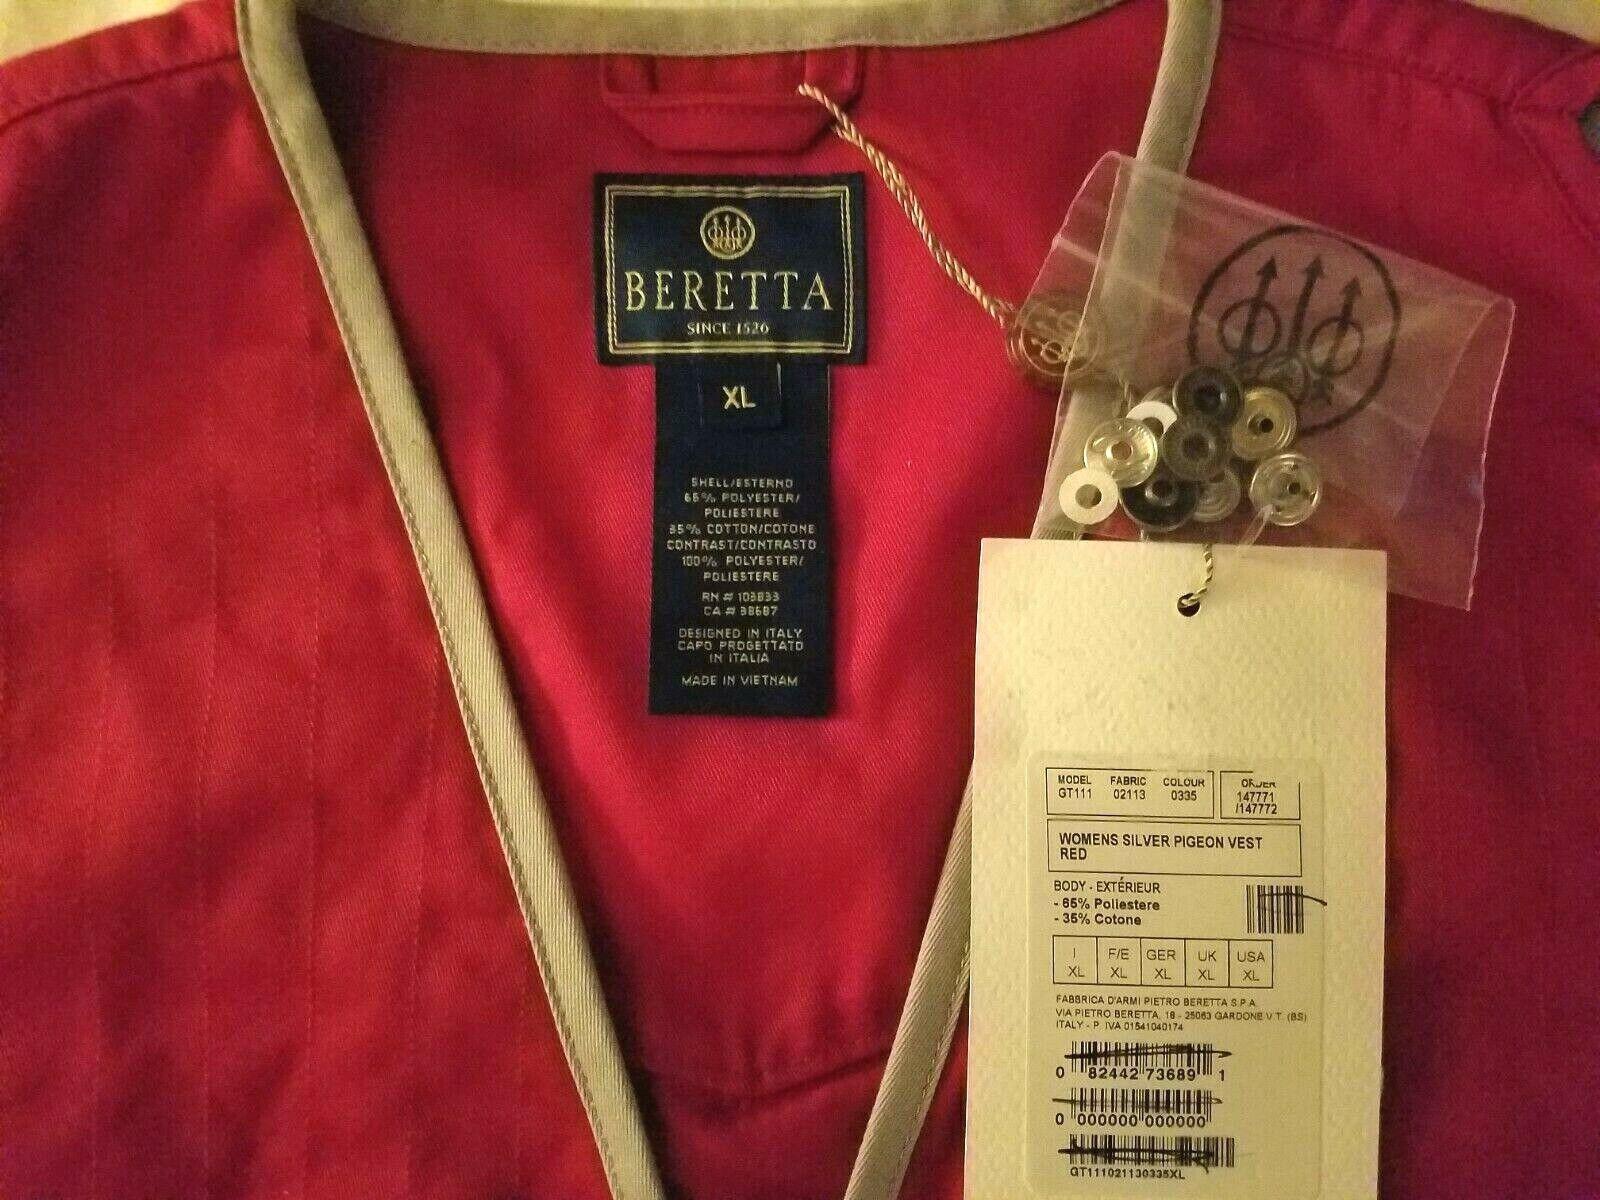 Free Ship Choose Size Beretta Women/'s Vest Silver Pigeon Vest Red GT111-0335